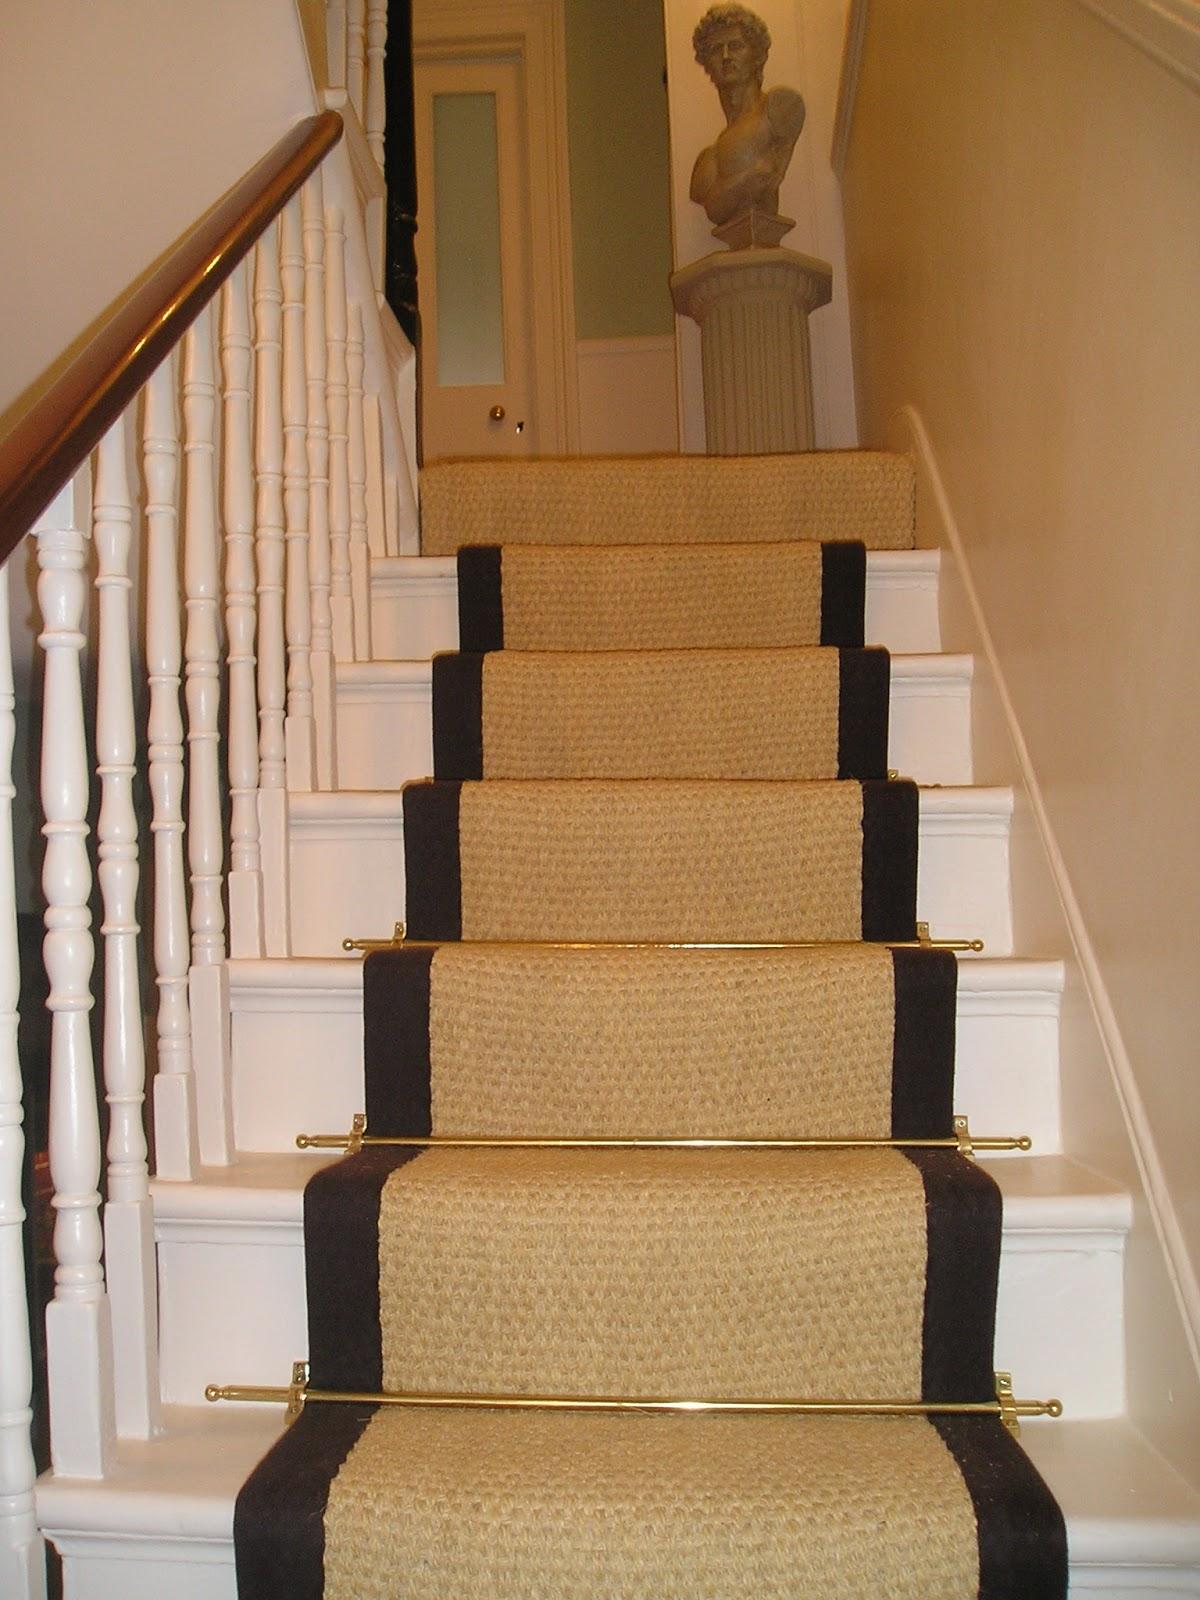 bleached coir stair carpet runner with brown border.jpg